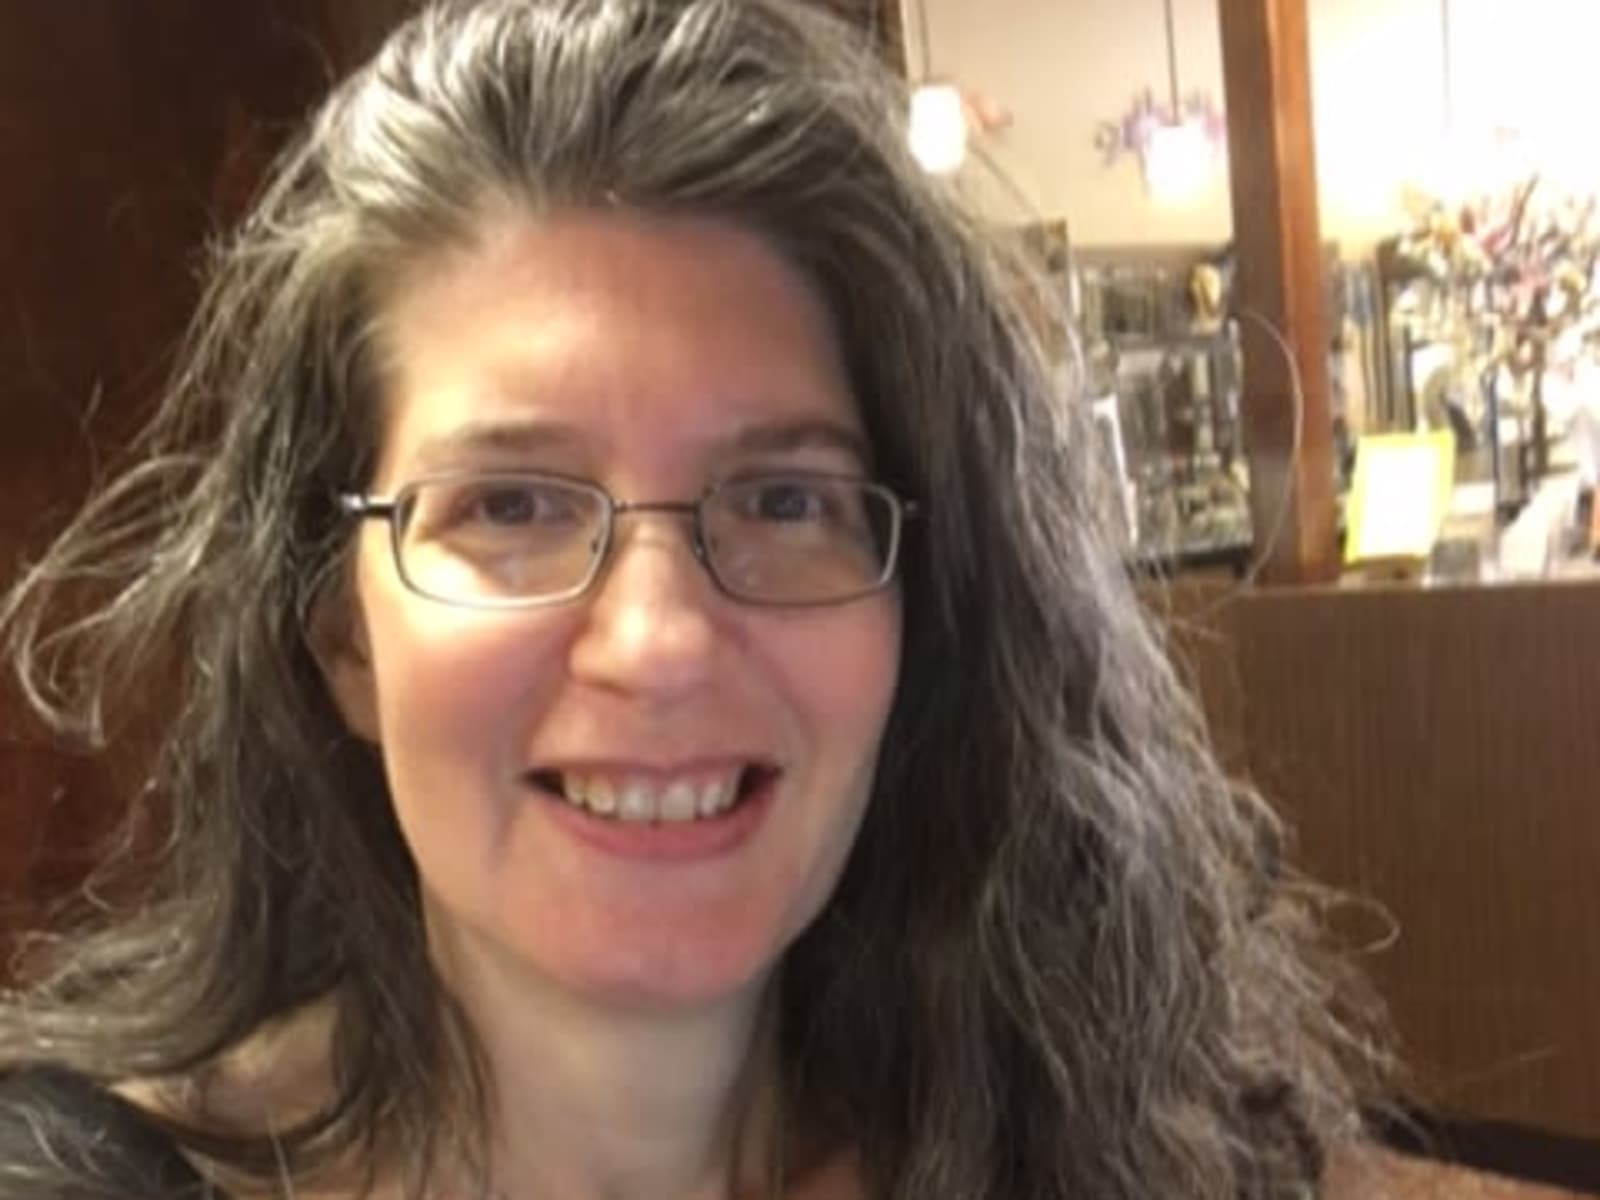 Heidi from Tucson, Arizona, United States